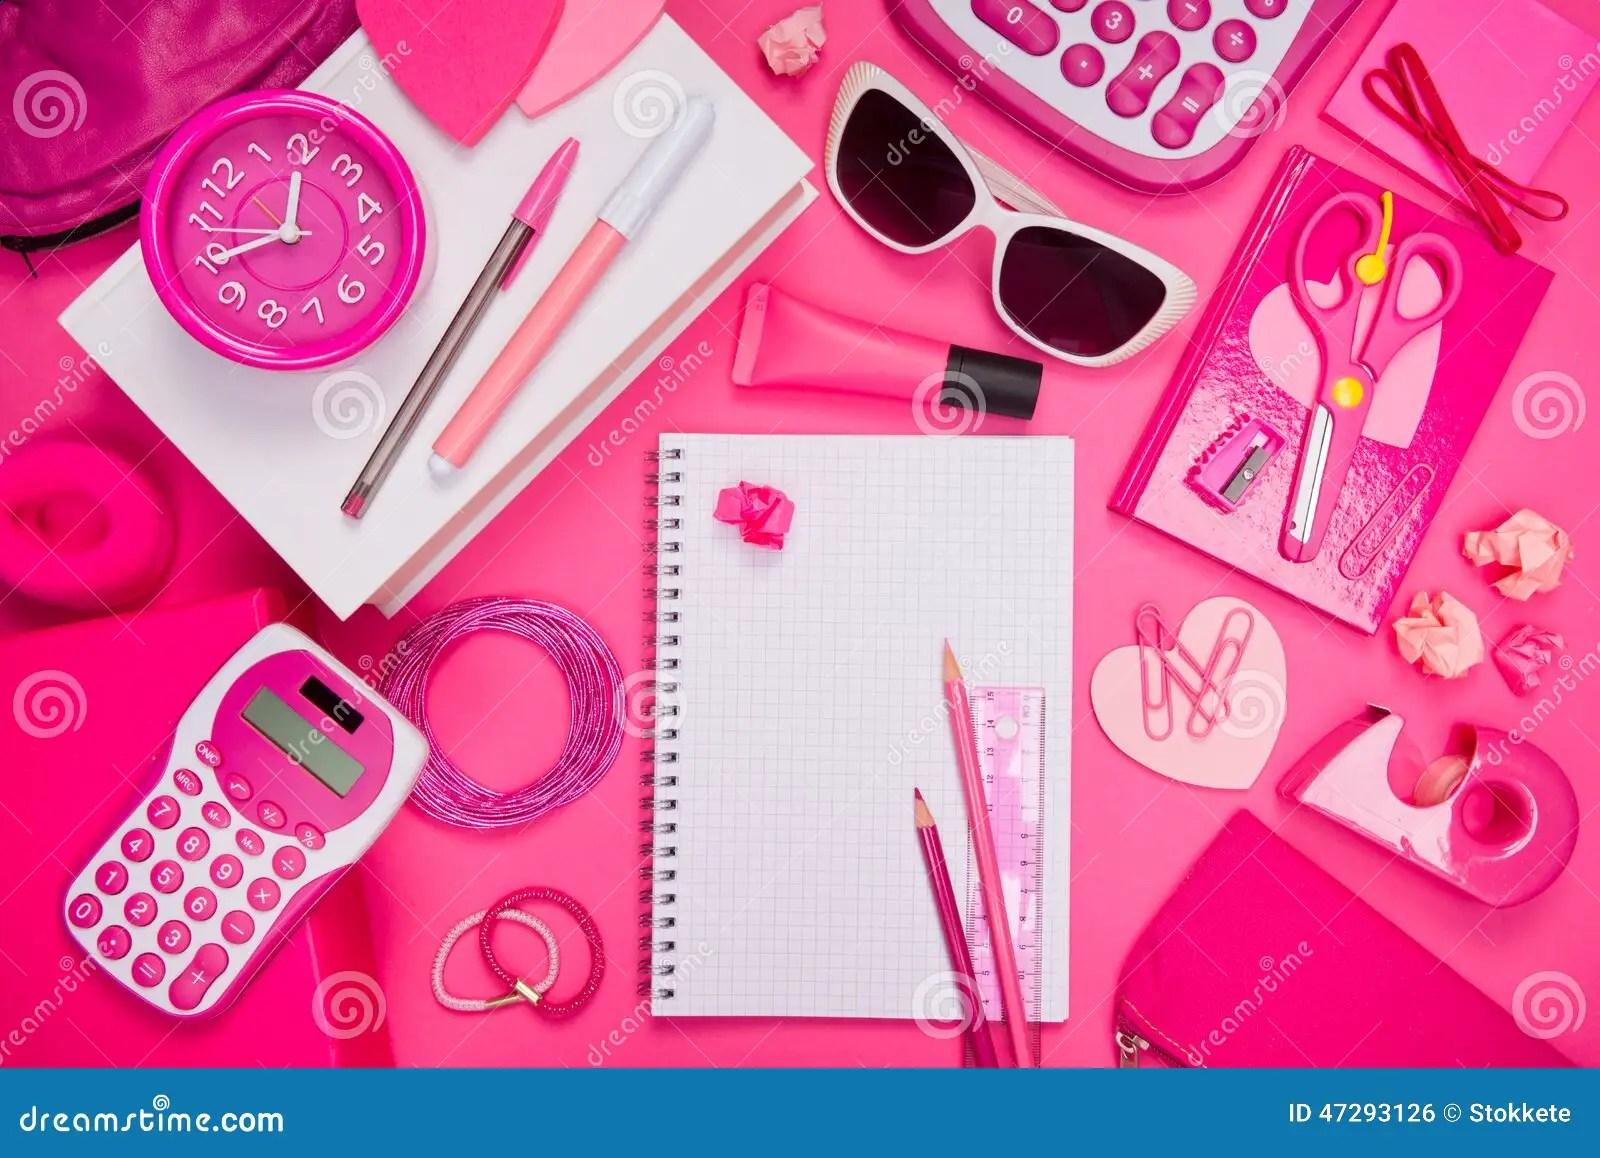 Bureau Et Papeterie Roses Girly Photo Stock Image Du